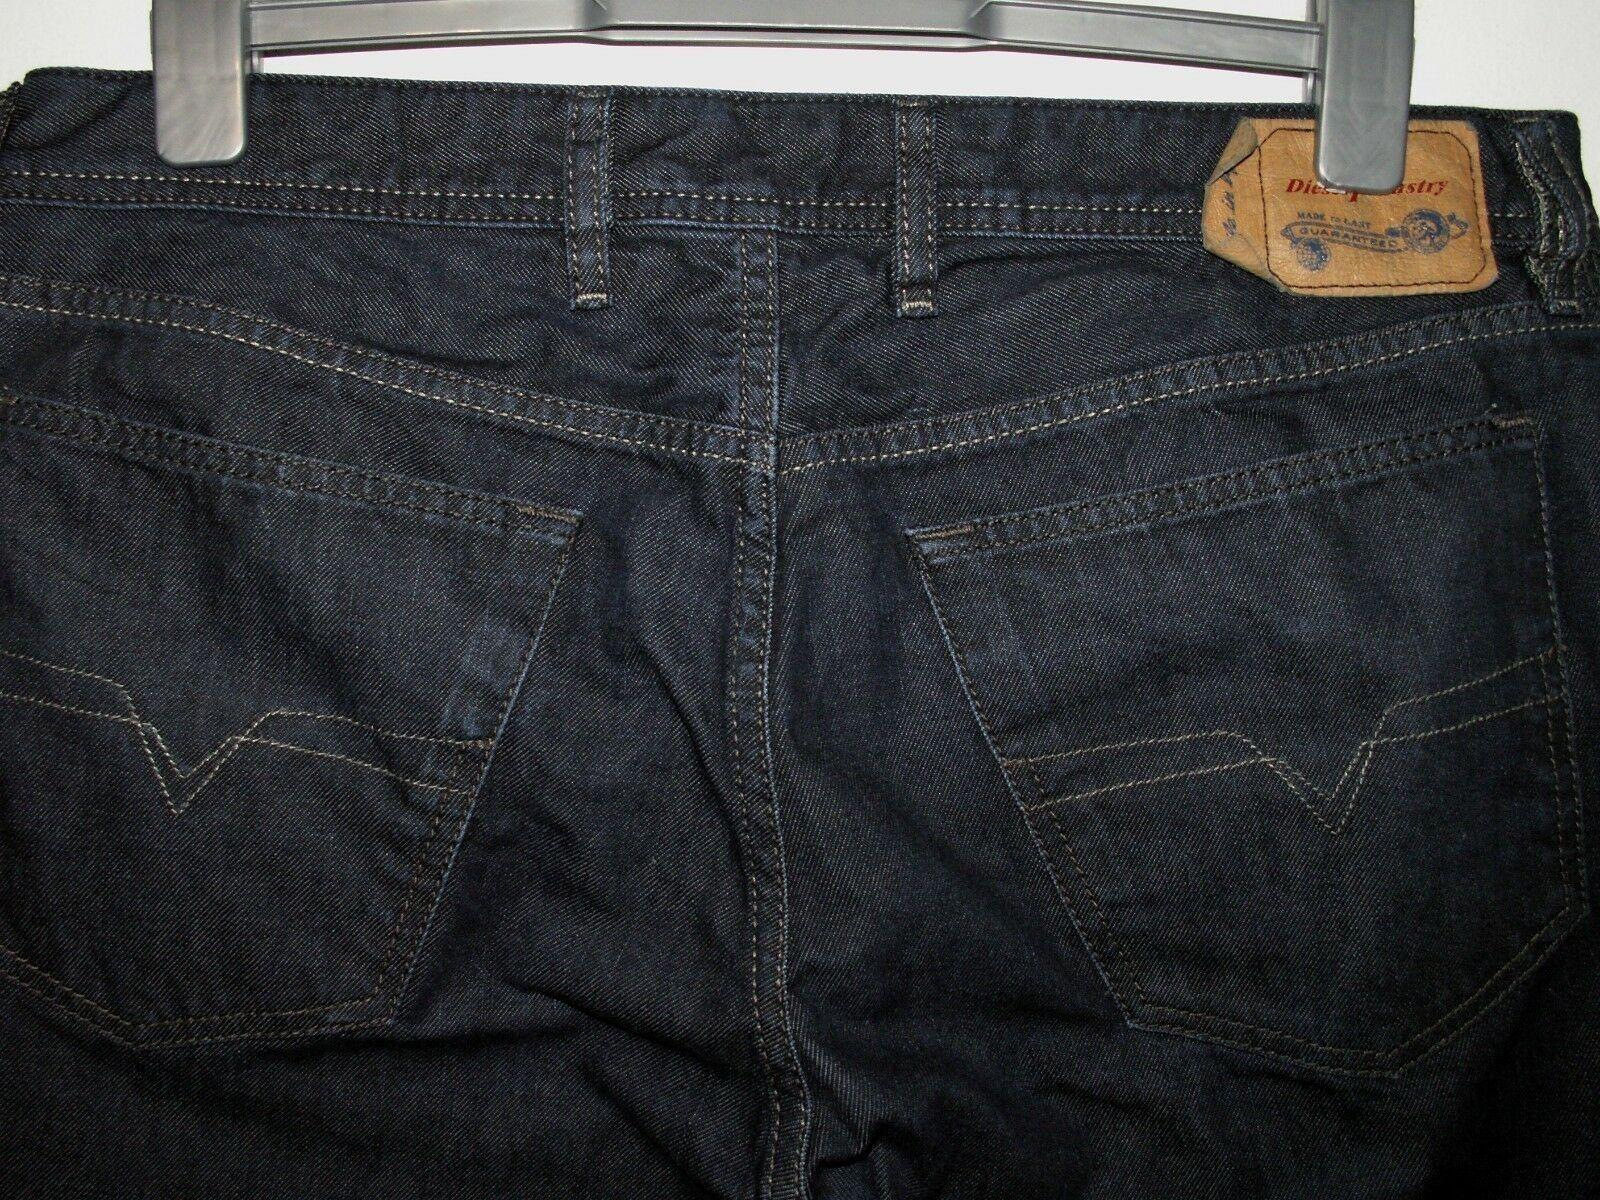 Diesel waykee regular-straight fit jeans wash 0088Z W36 L30 (a4530)